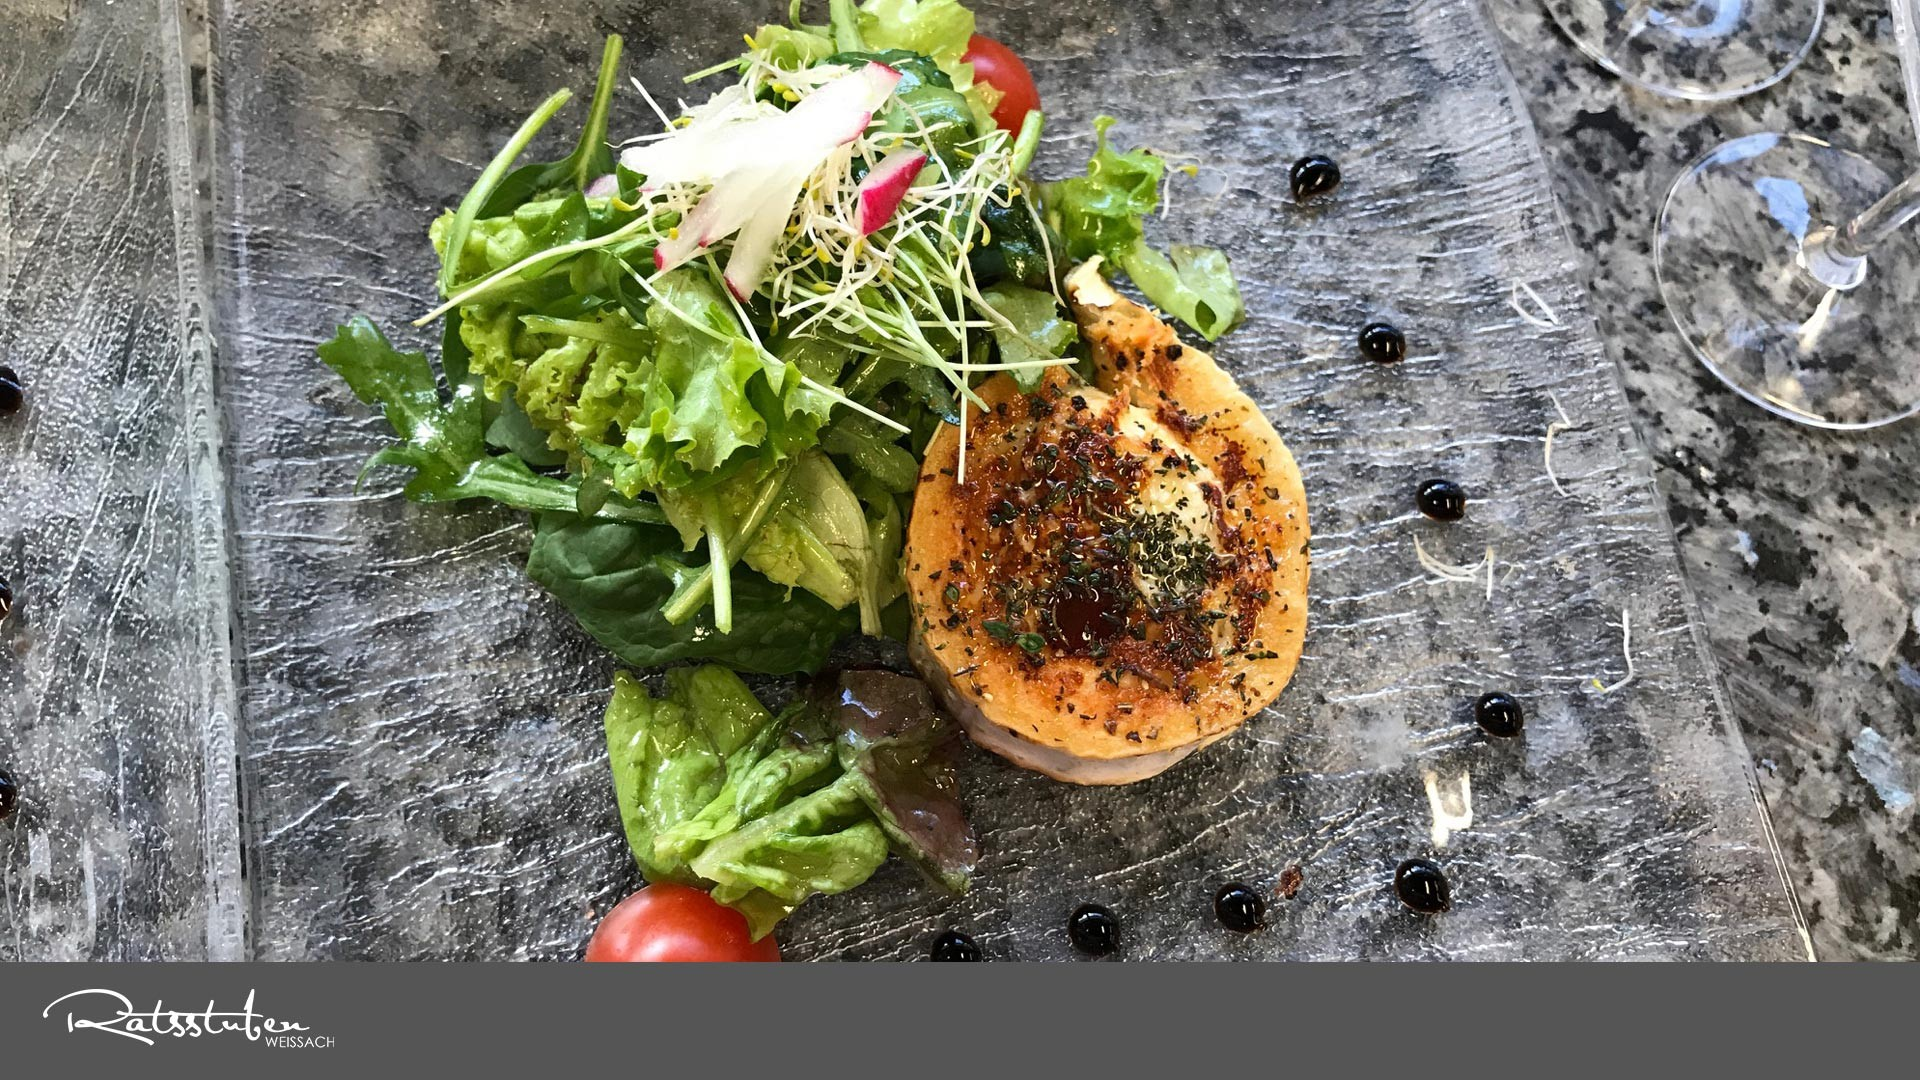 Ratsstuben Weissach: SlowFood-Küche, Glutenfrei, Laktosefrei, vegetarisch & vegan